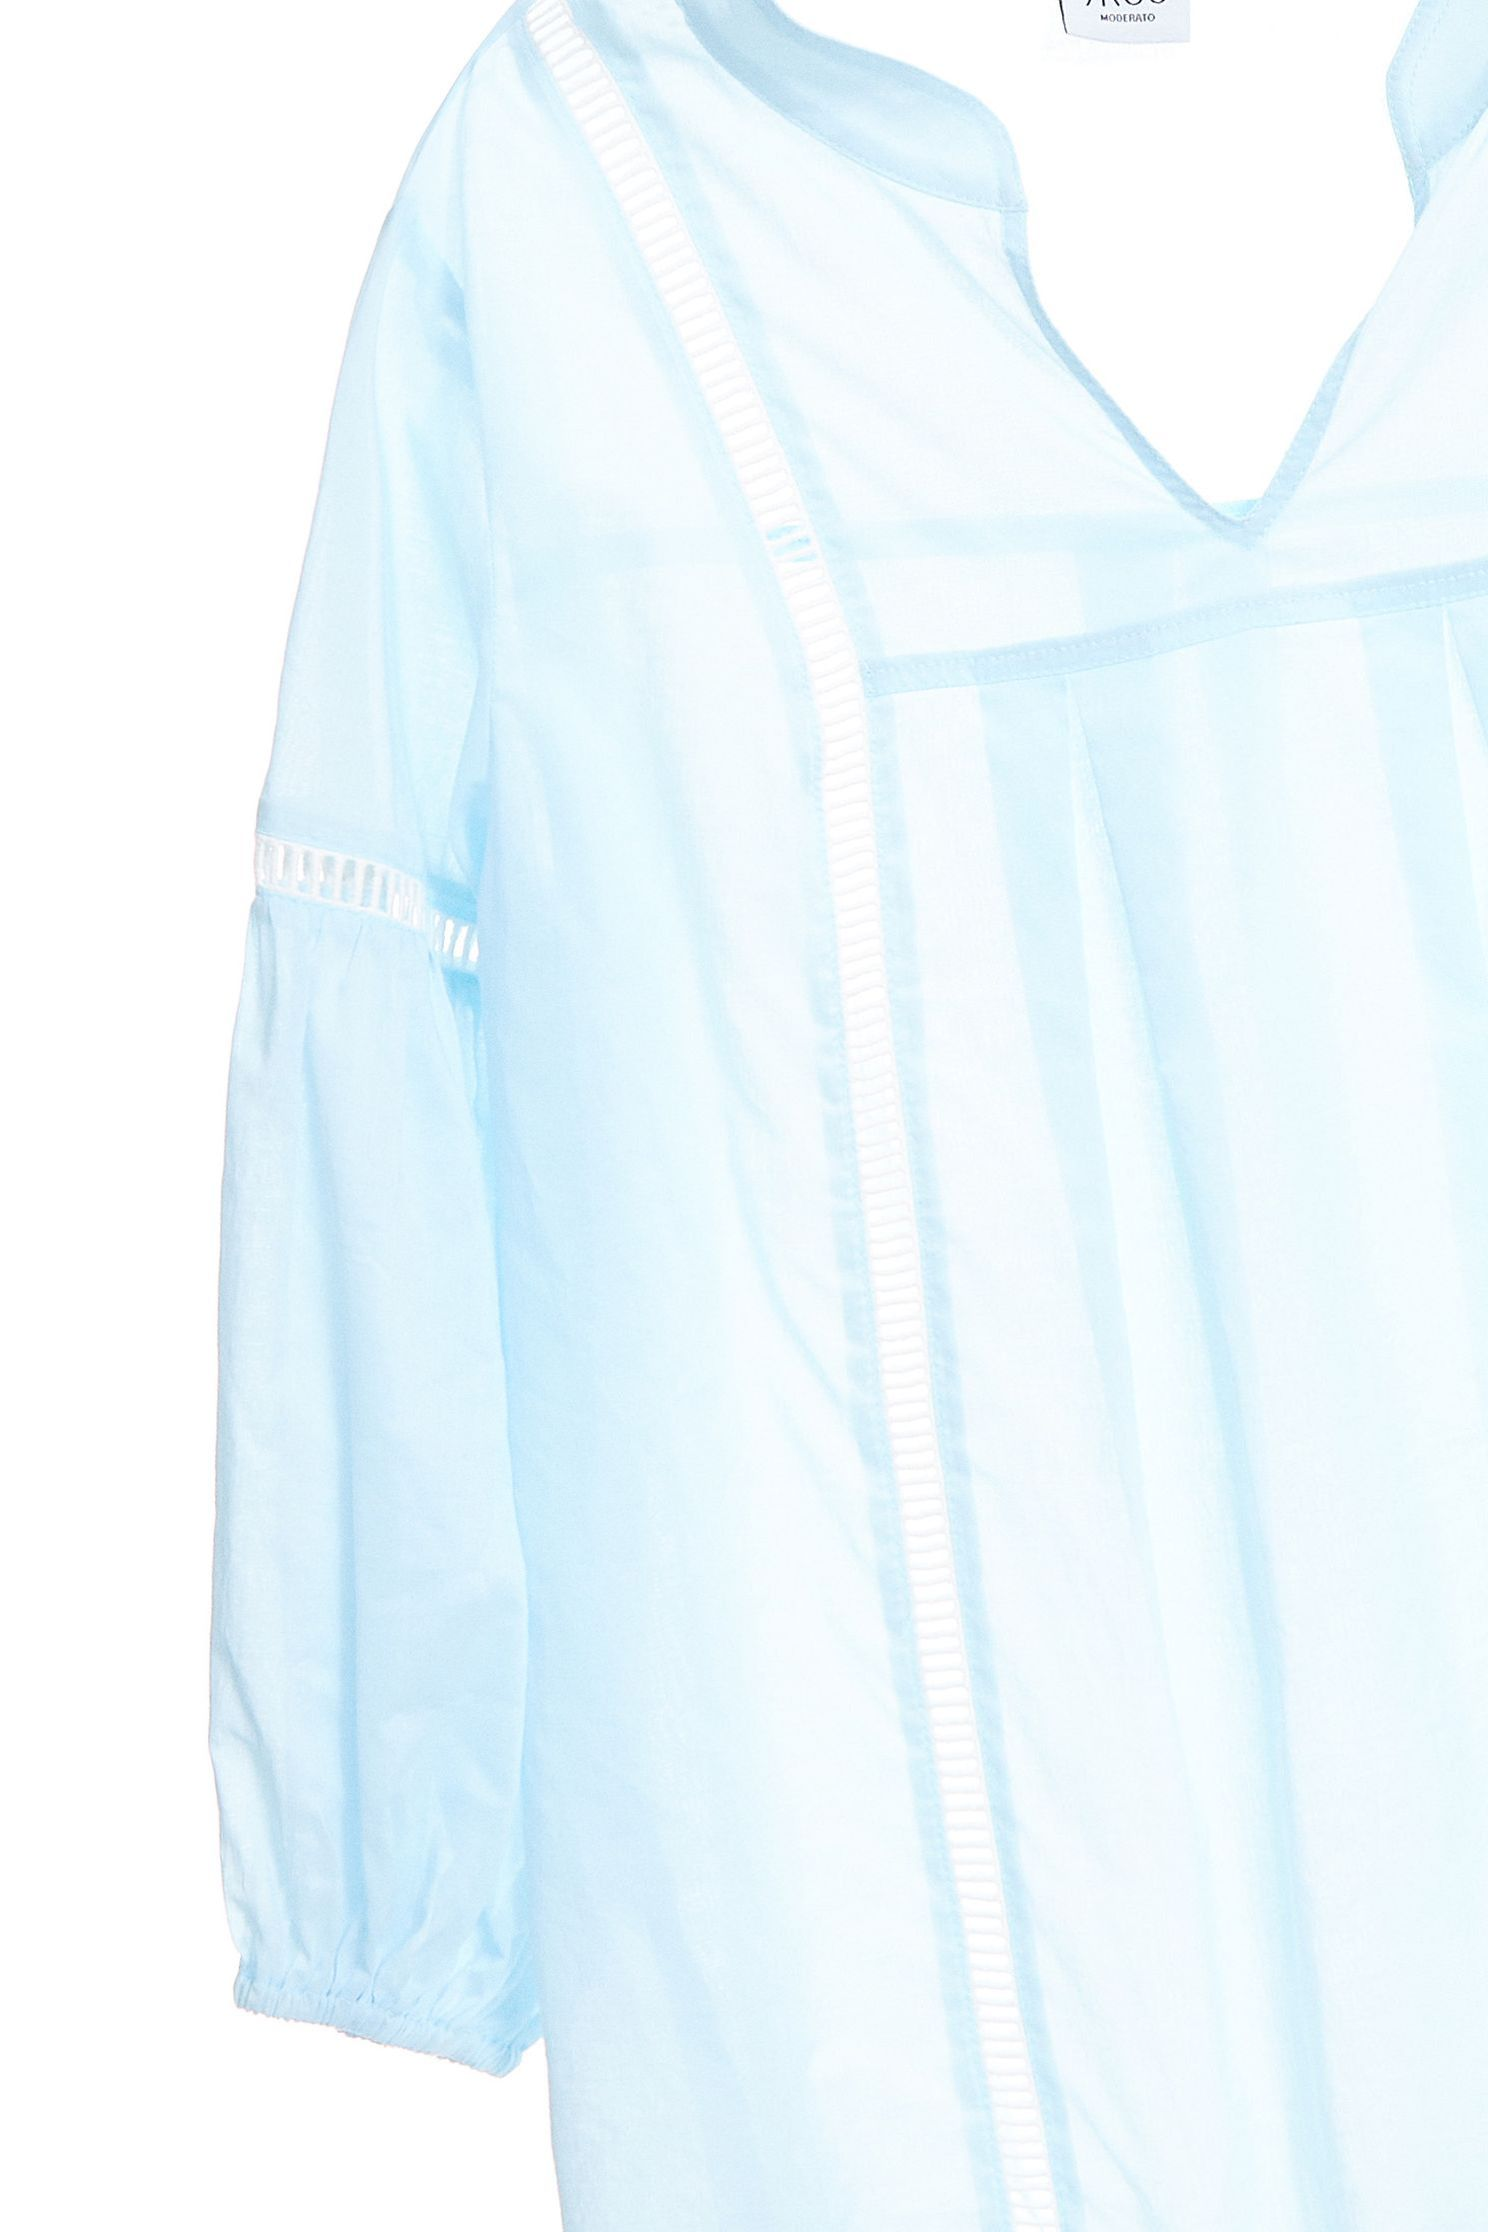 Ethnic style fashion tops,v-necktop,top,cotton,longtop,longsleevetop